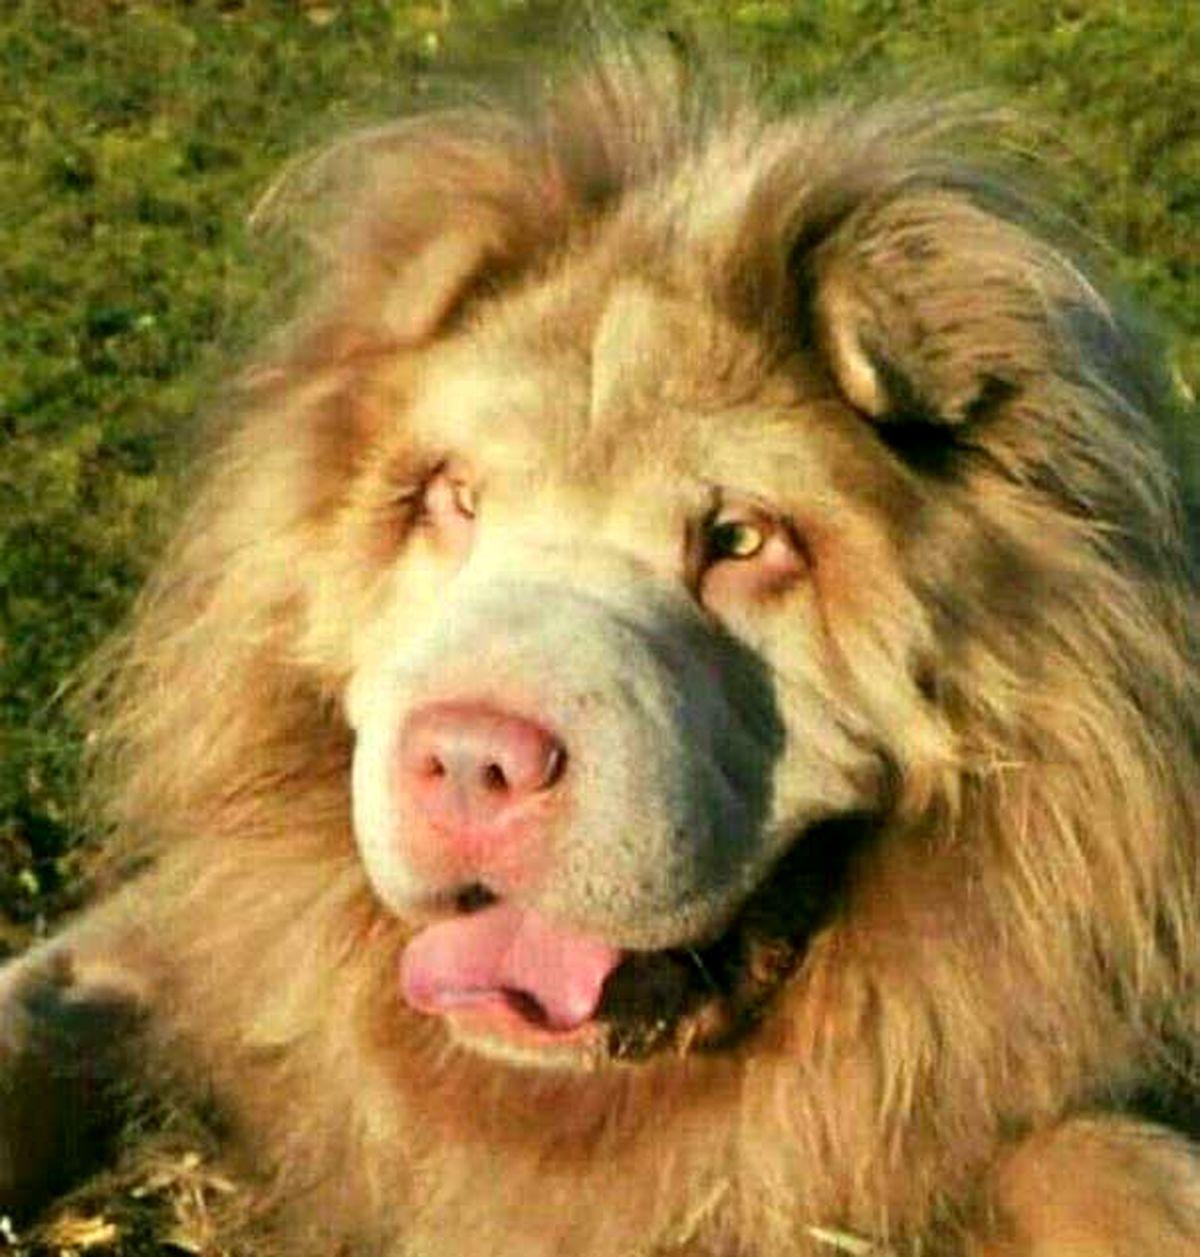 تصویر سگی عجیب به شکل شیر سلطان جنگل